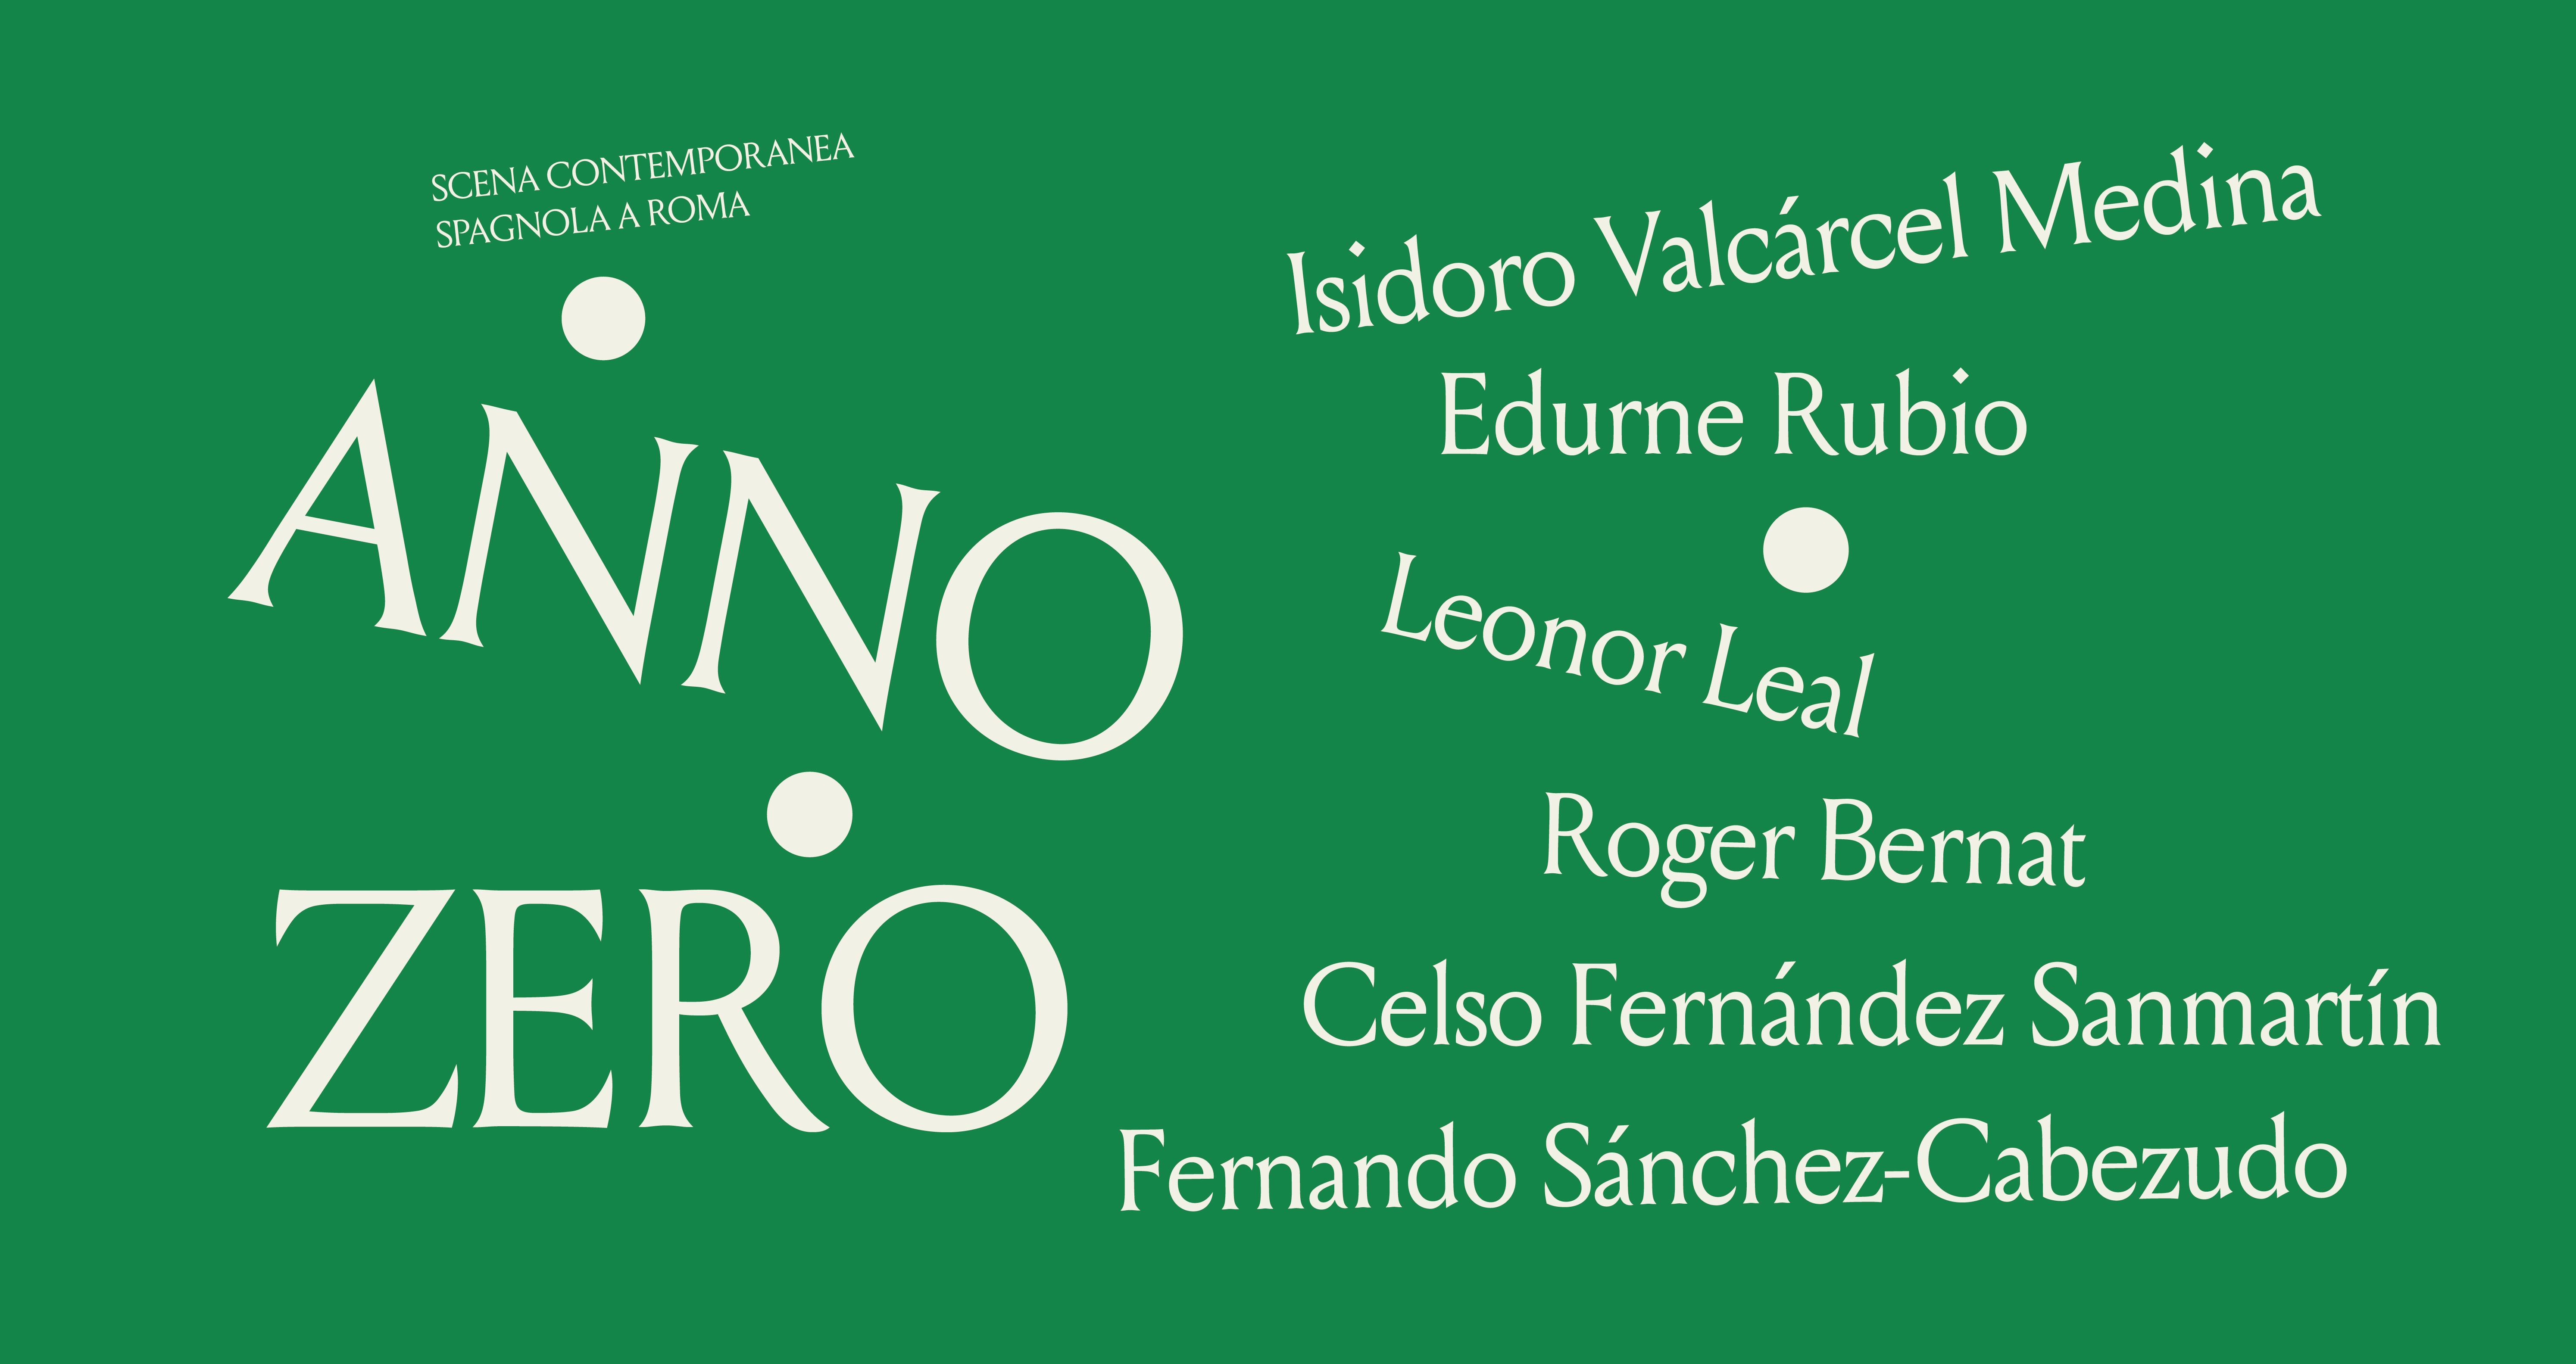 191120 - Raer - Anno Zero - Portada evento fb (1)